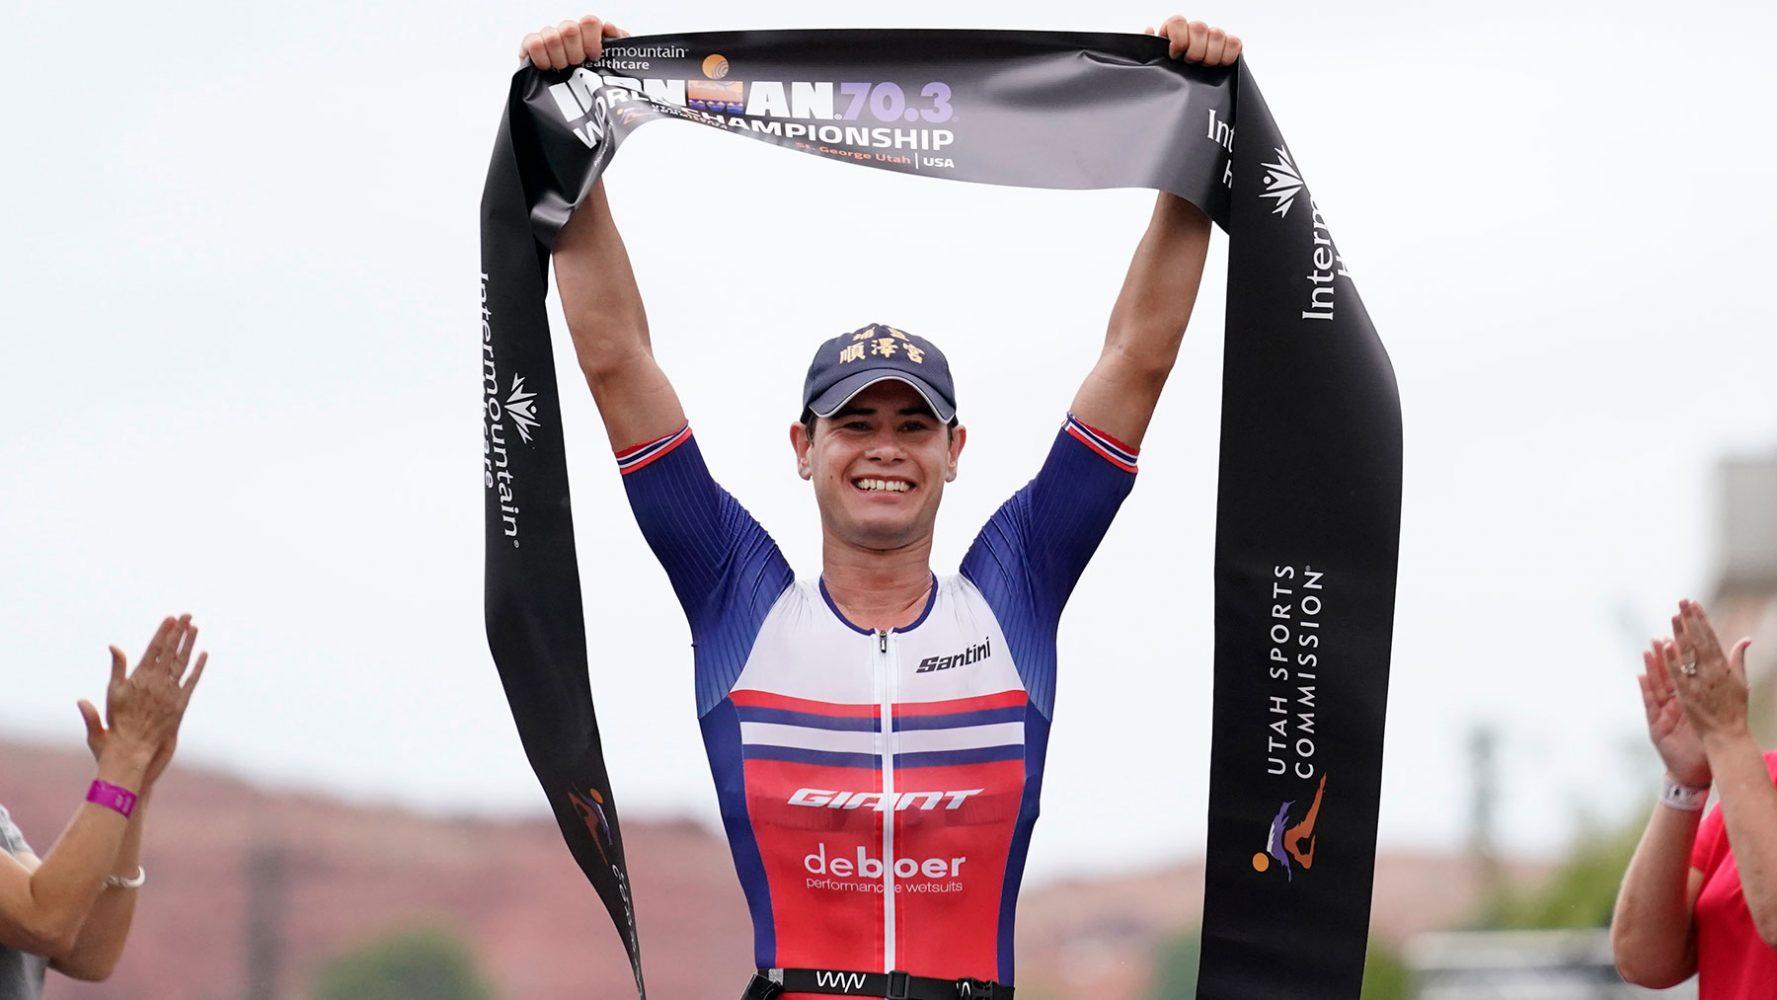 Gustav Iden – Ironman 70.3 2021 World Champion